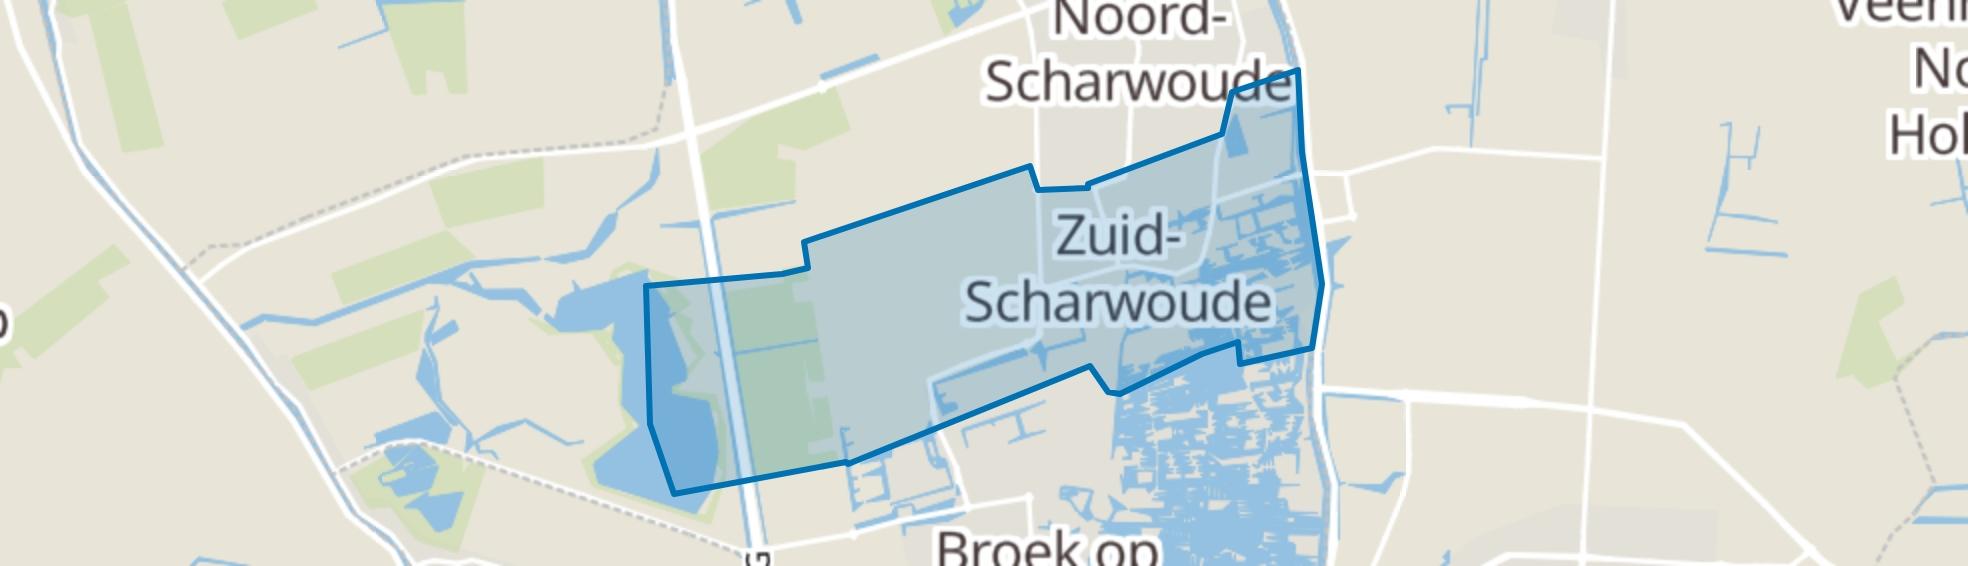 Zuid-Scharwoude map